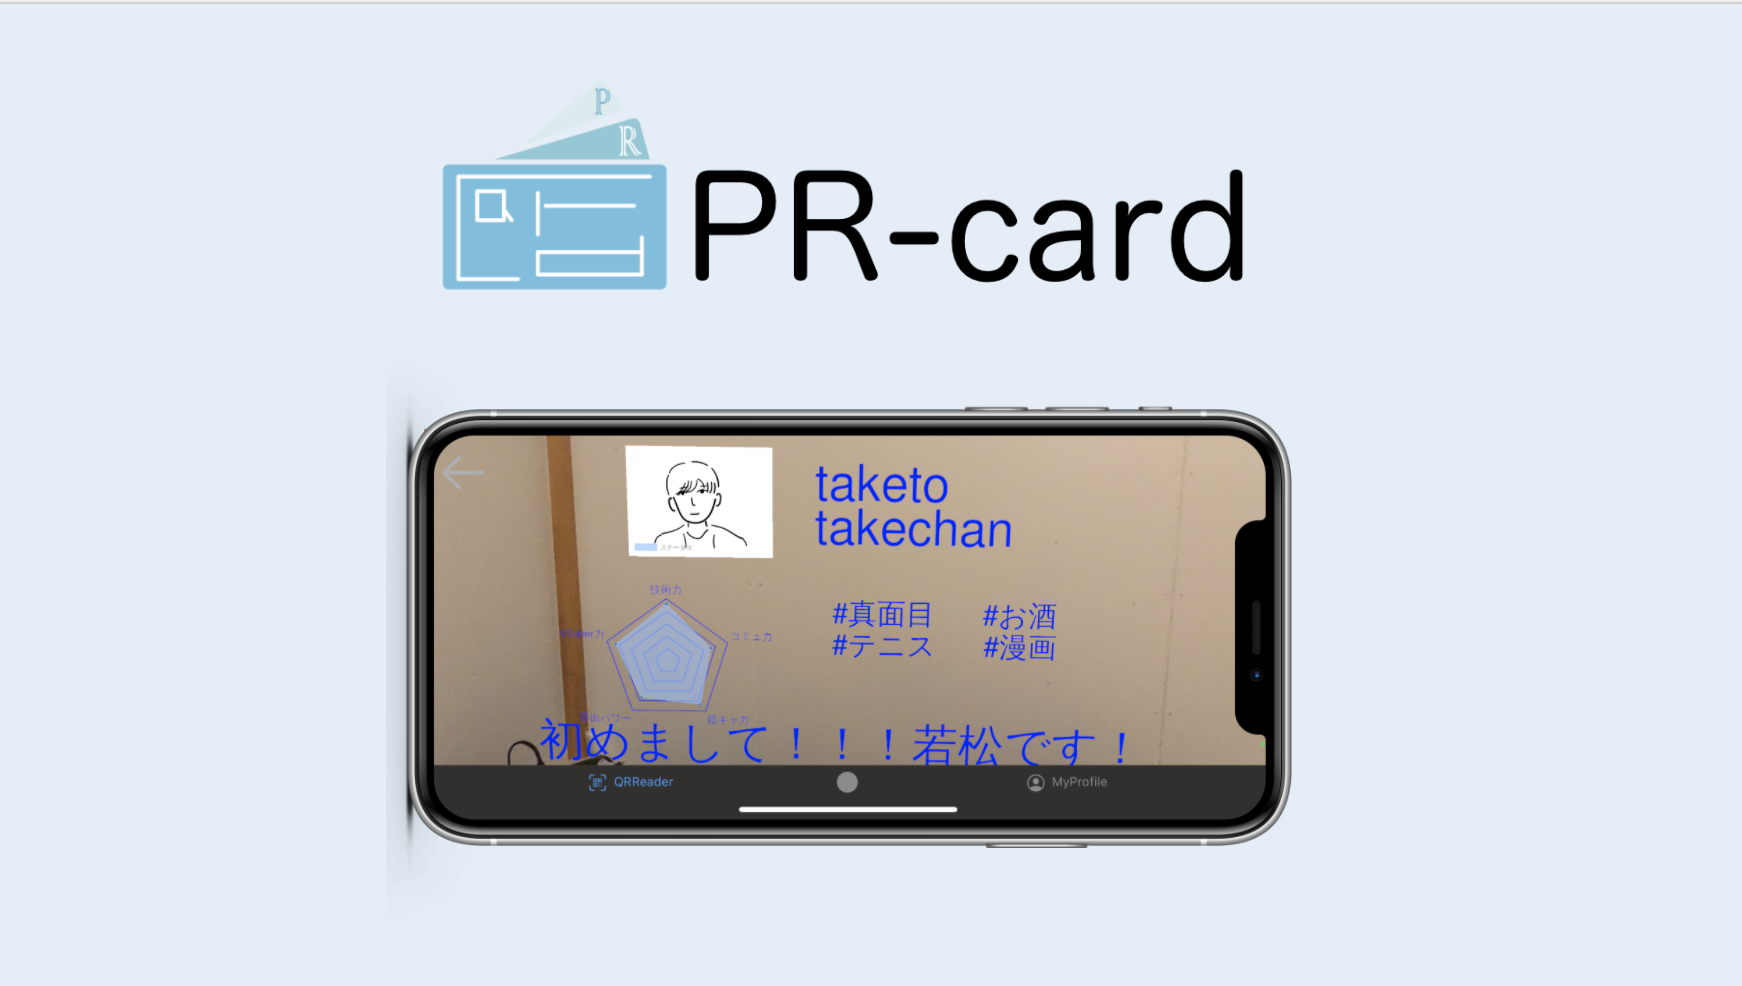 PR-card